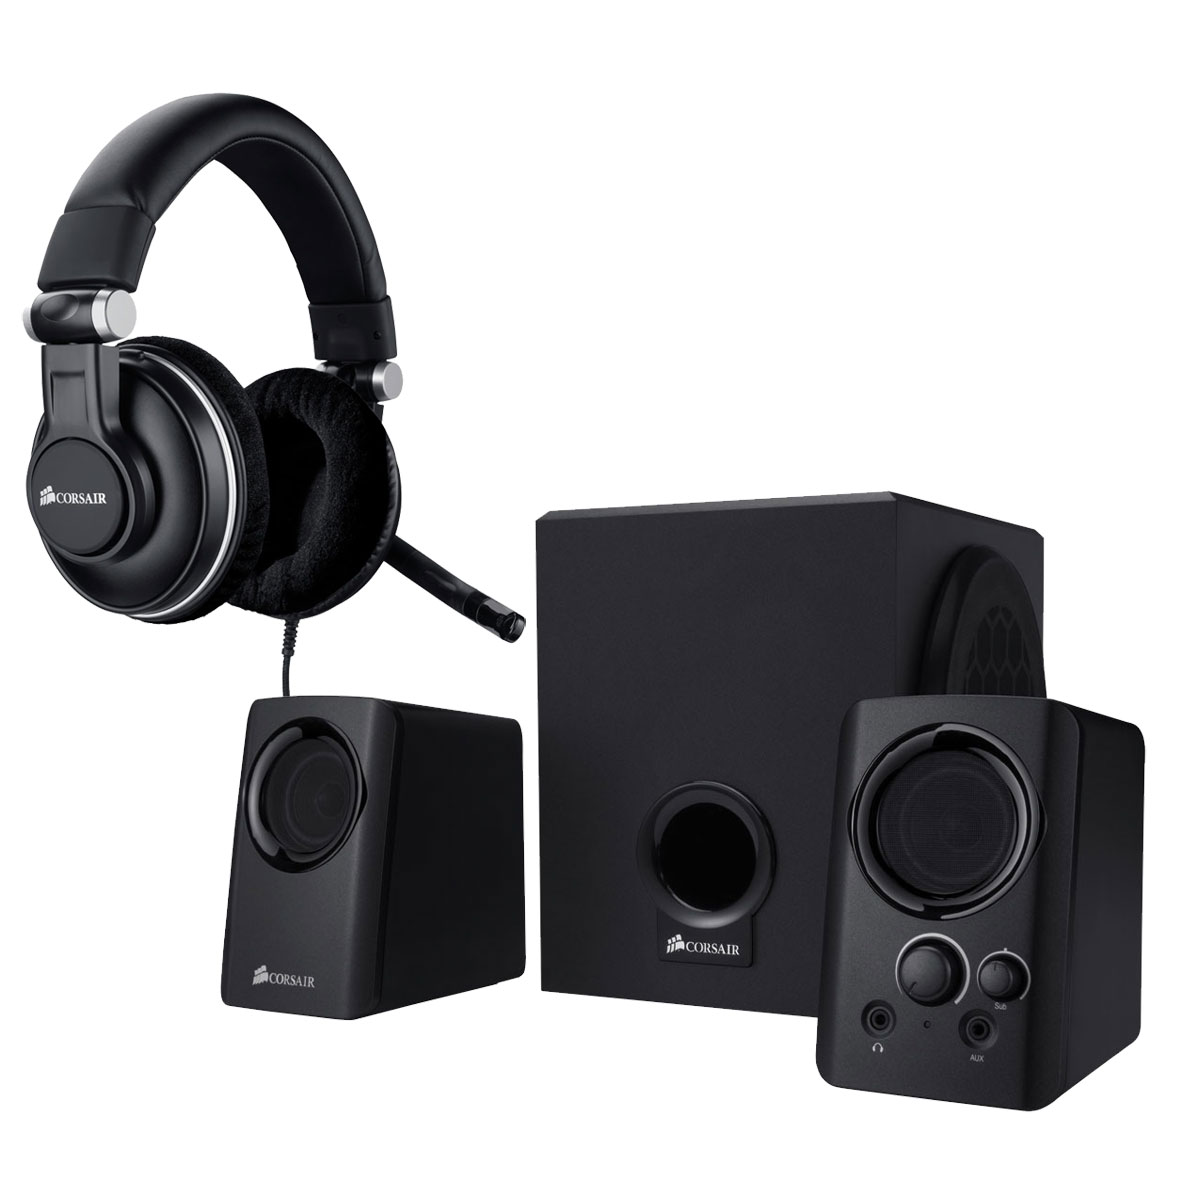 Micro-casque Corsair HS1A Gaming Headset + Corsair SP2200 Casque micro pour joueur + Enceintes 2.1